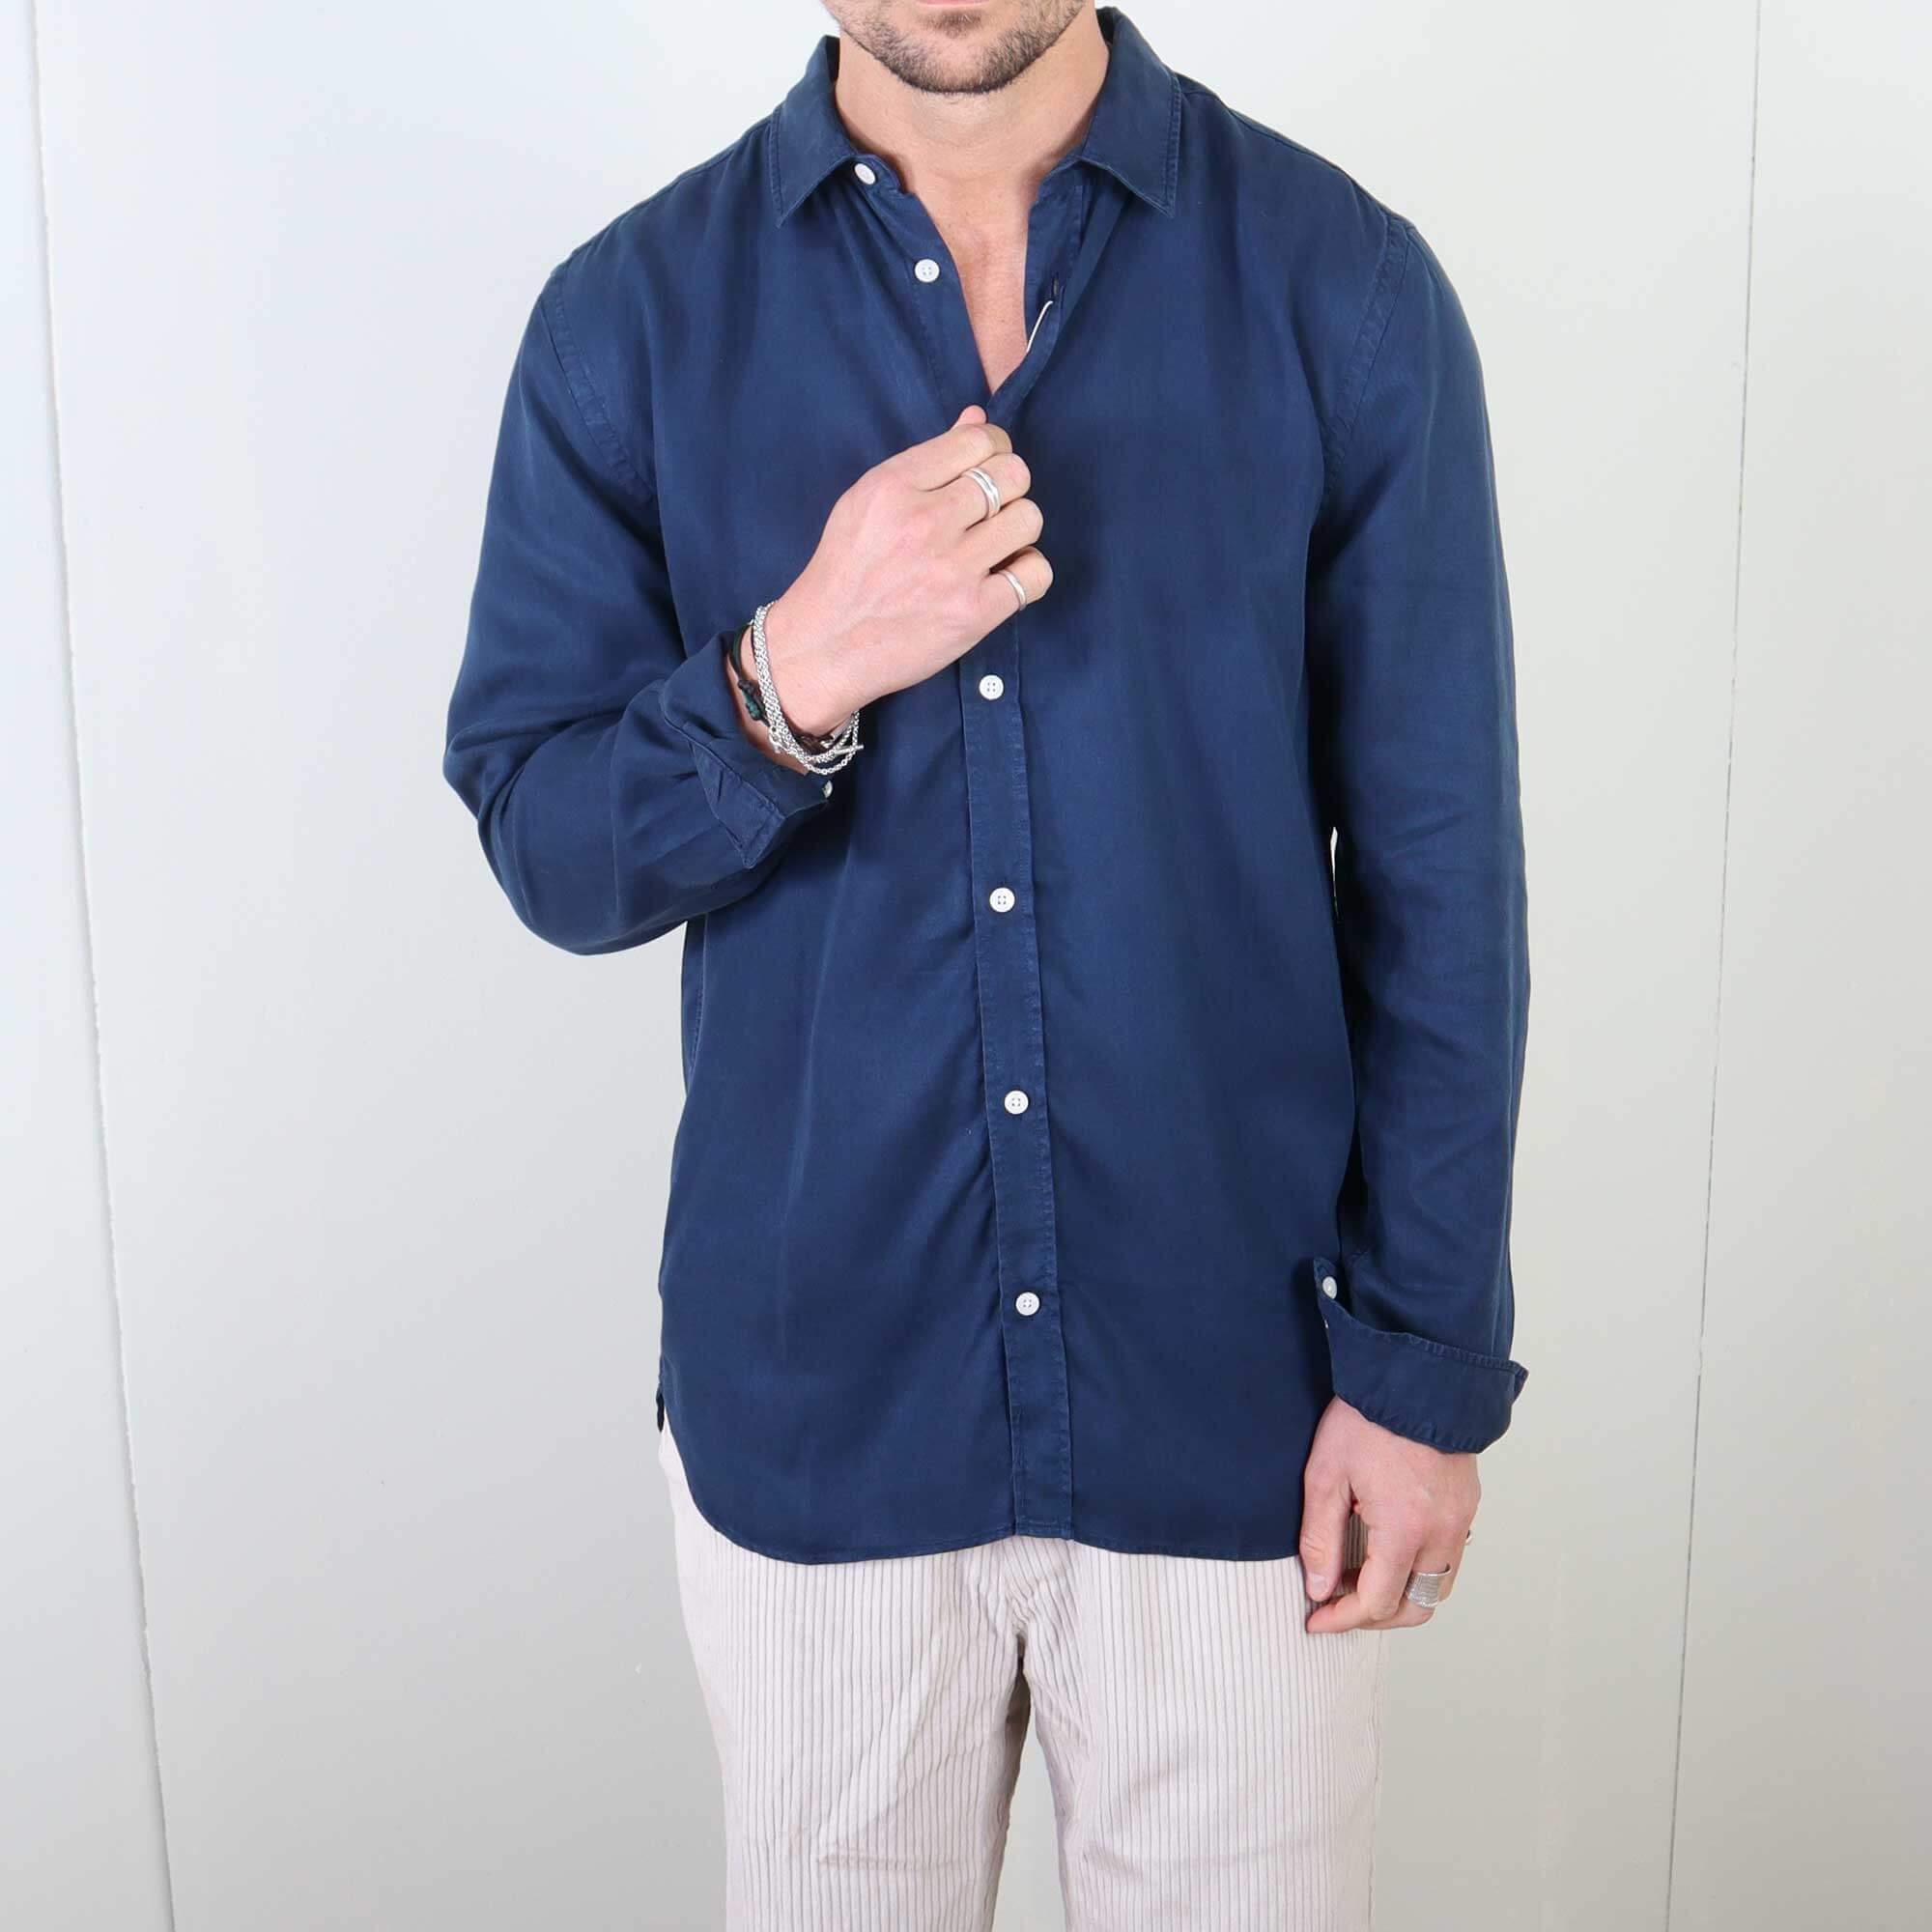 blouse-darkblue-2